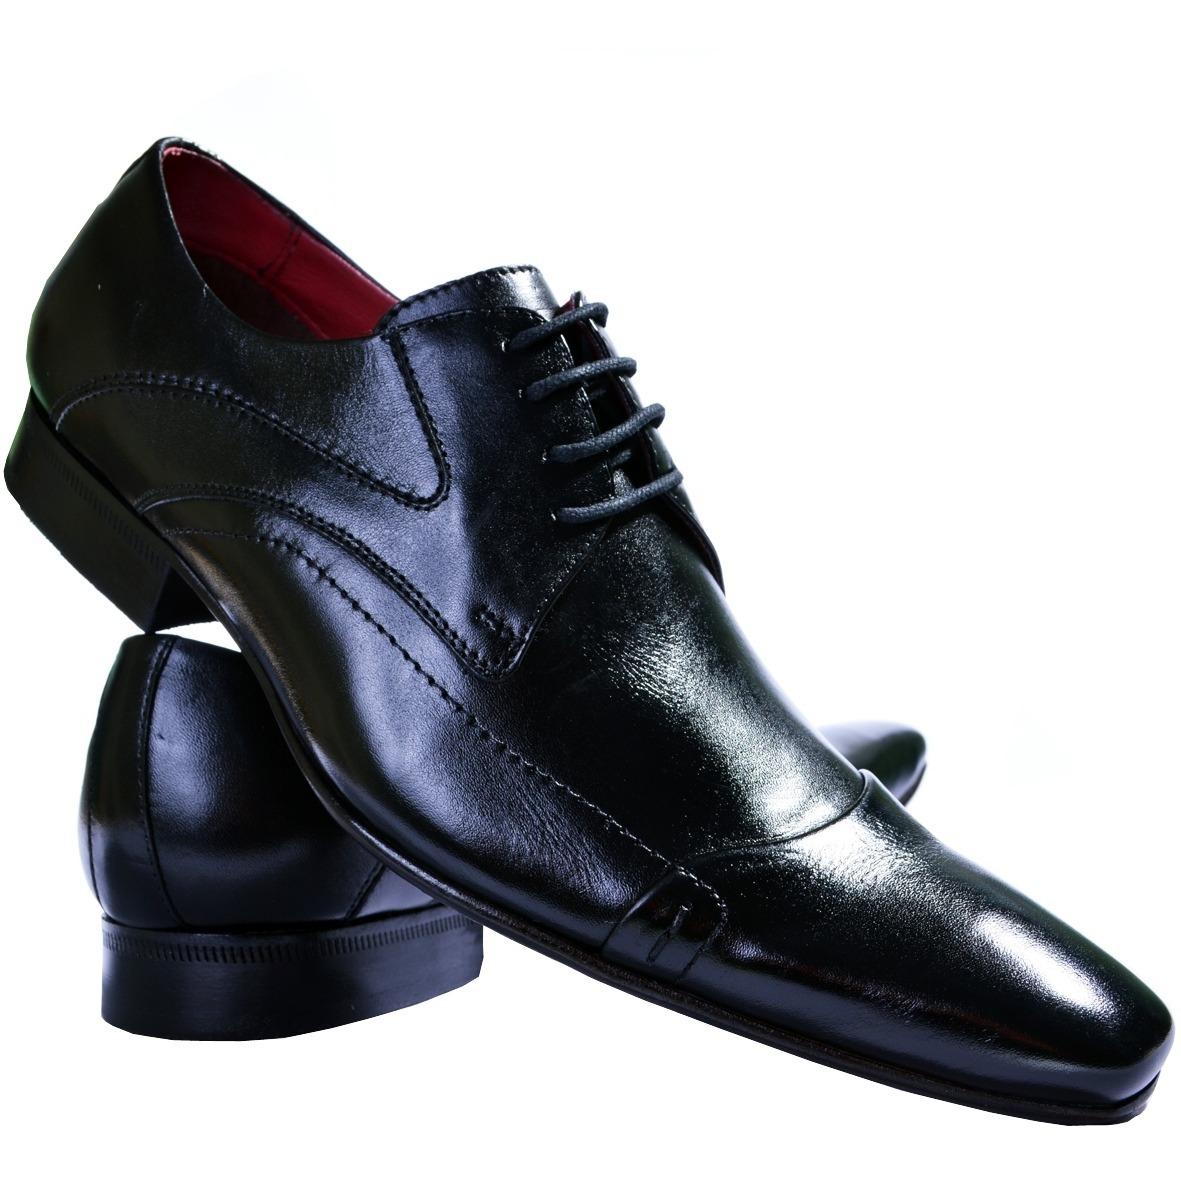 c873d4264 sapato social preto - bico italiano - paulo vieira, ref.:405. Carregando  zoom.